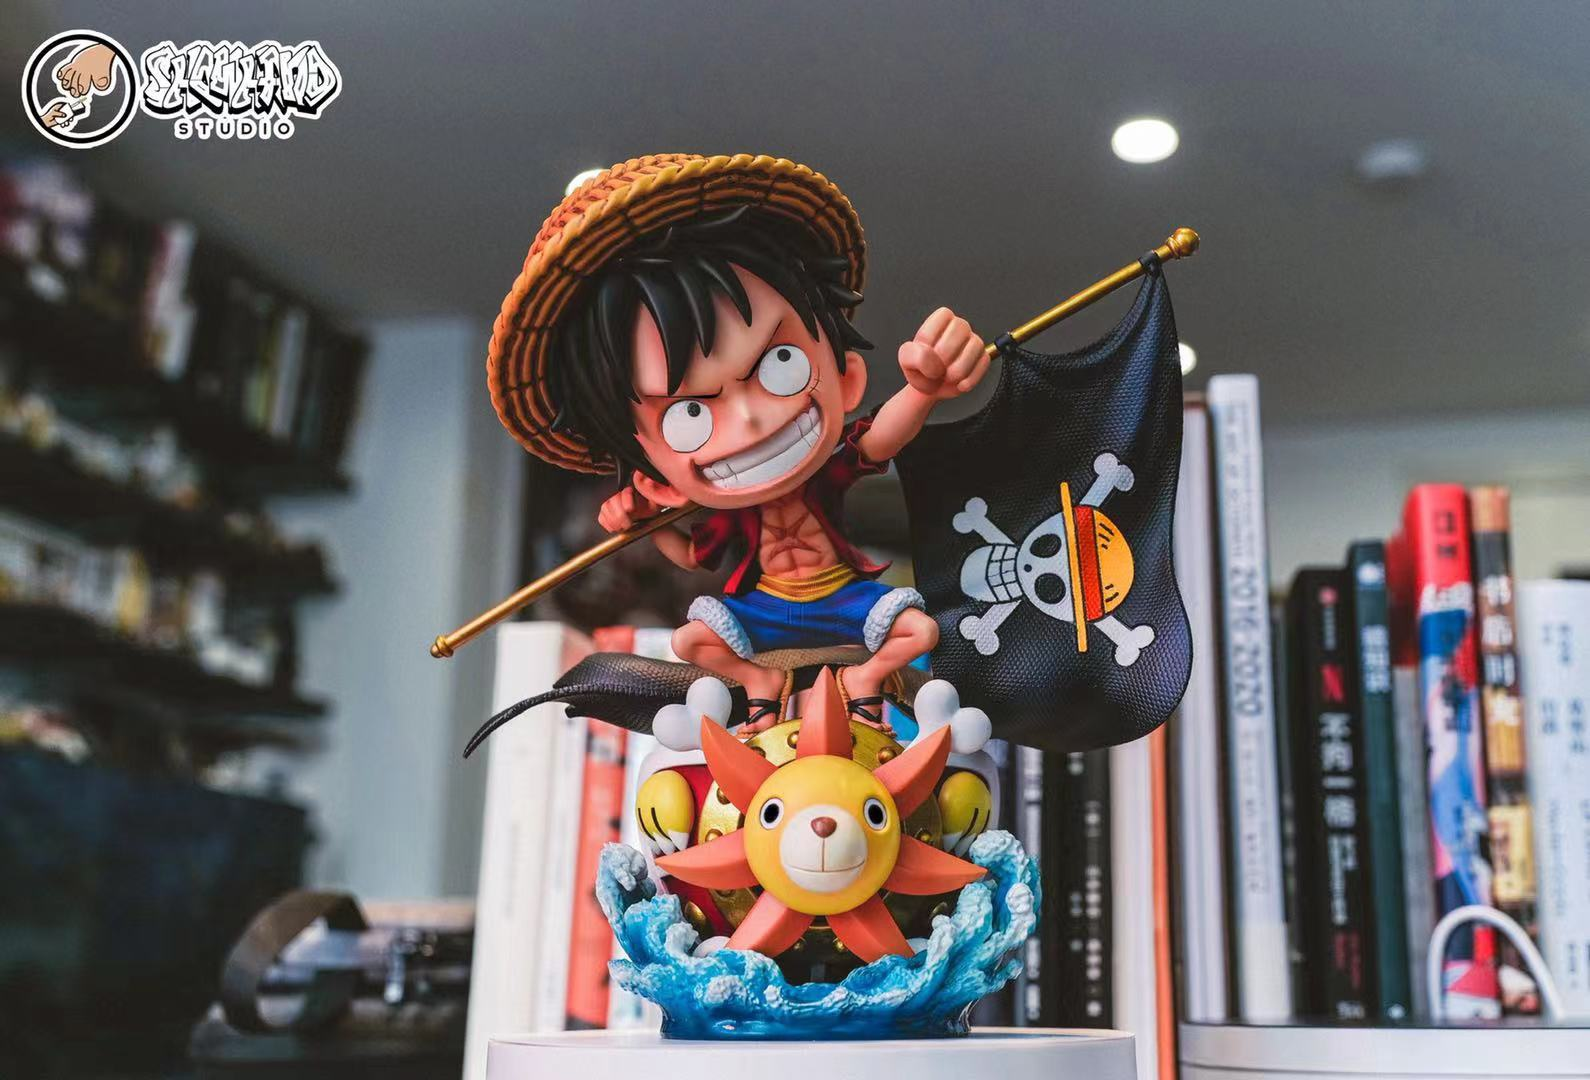 Monkey D. Luffy ลูฟี่ Showhand Studio (มัดจำ) [[SOLD OUT]]